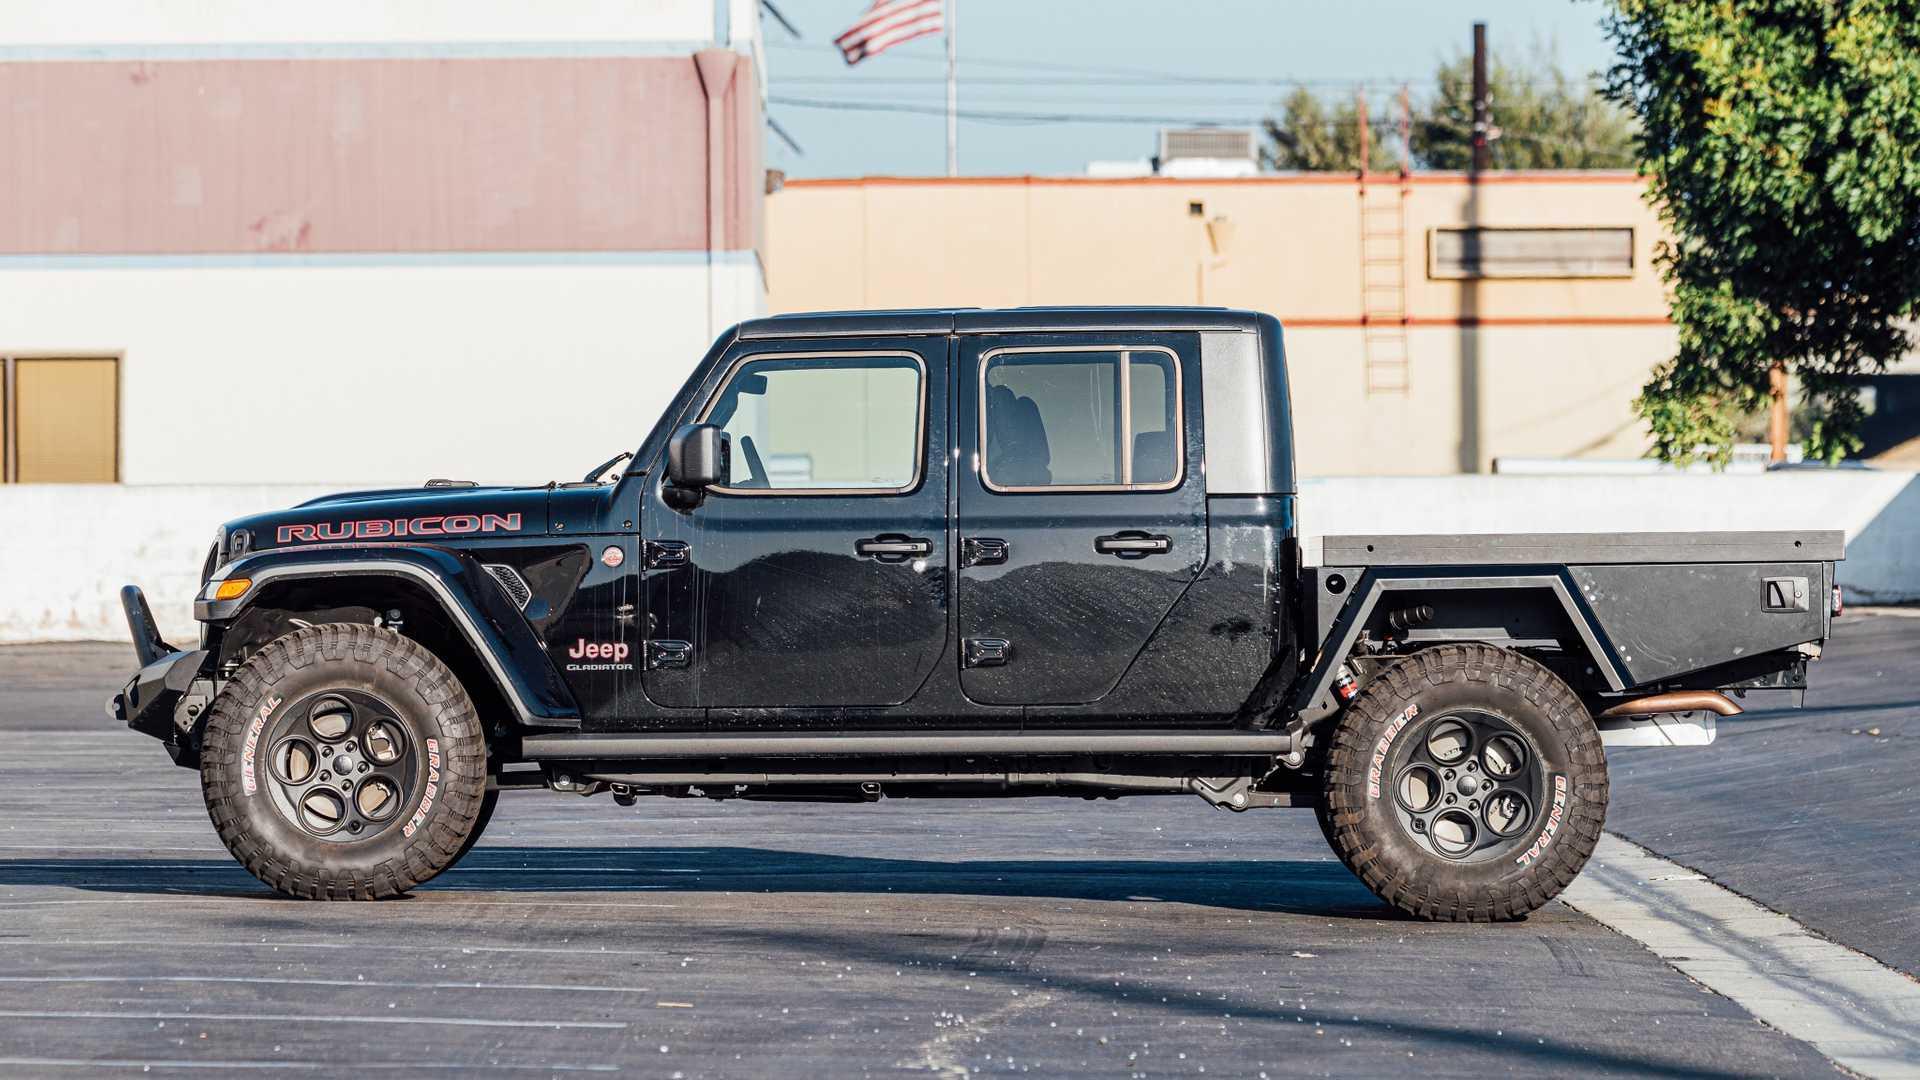 На базе пикапа Jeep Gladiator сделали автофургон